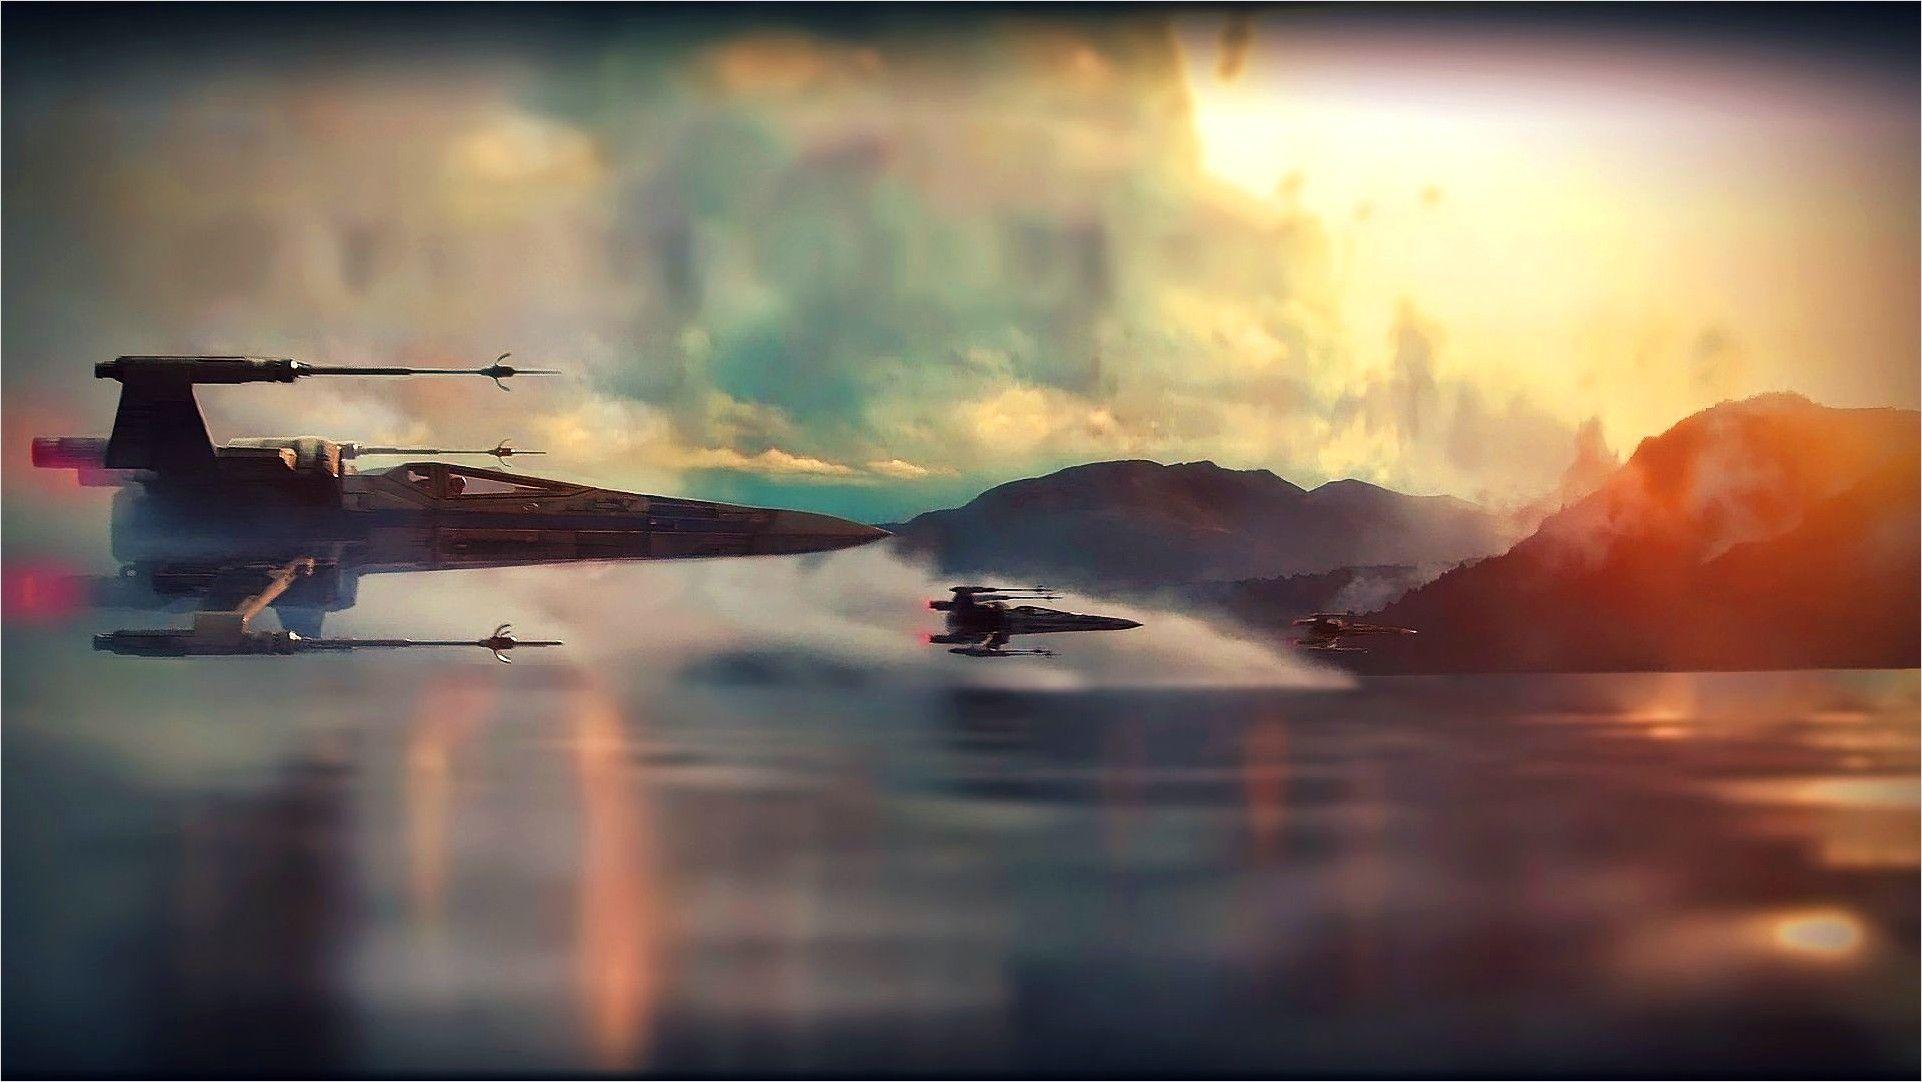 4k Landscape Wallpaper Reddit In 2020 Star Wars Wallpaper Star Wars Background Landscape Wallpaper